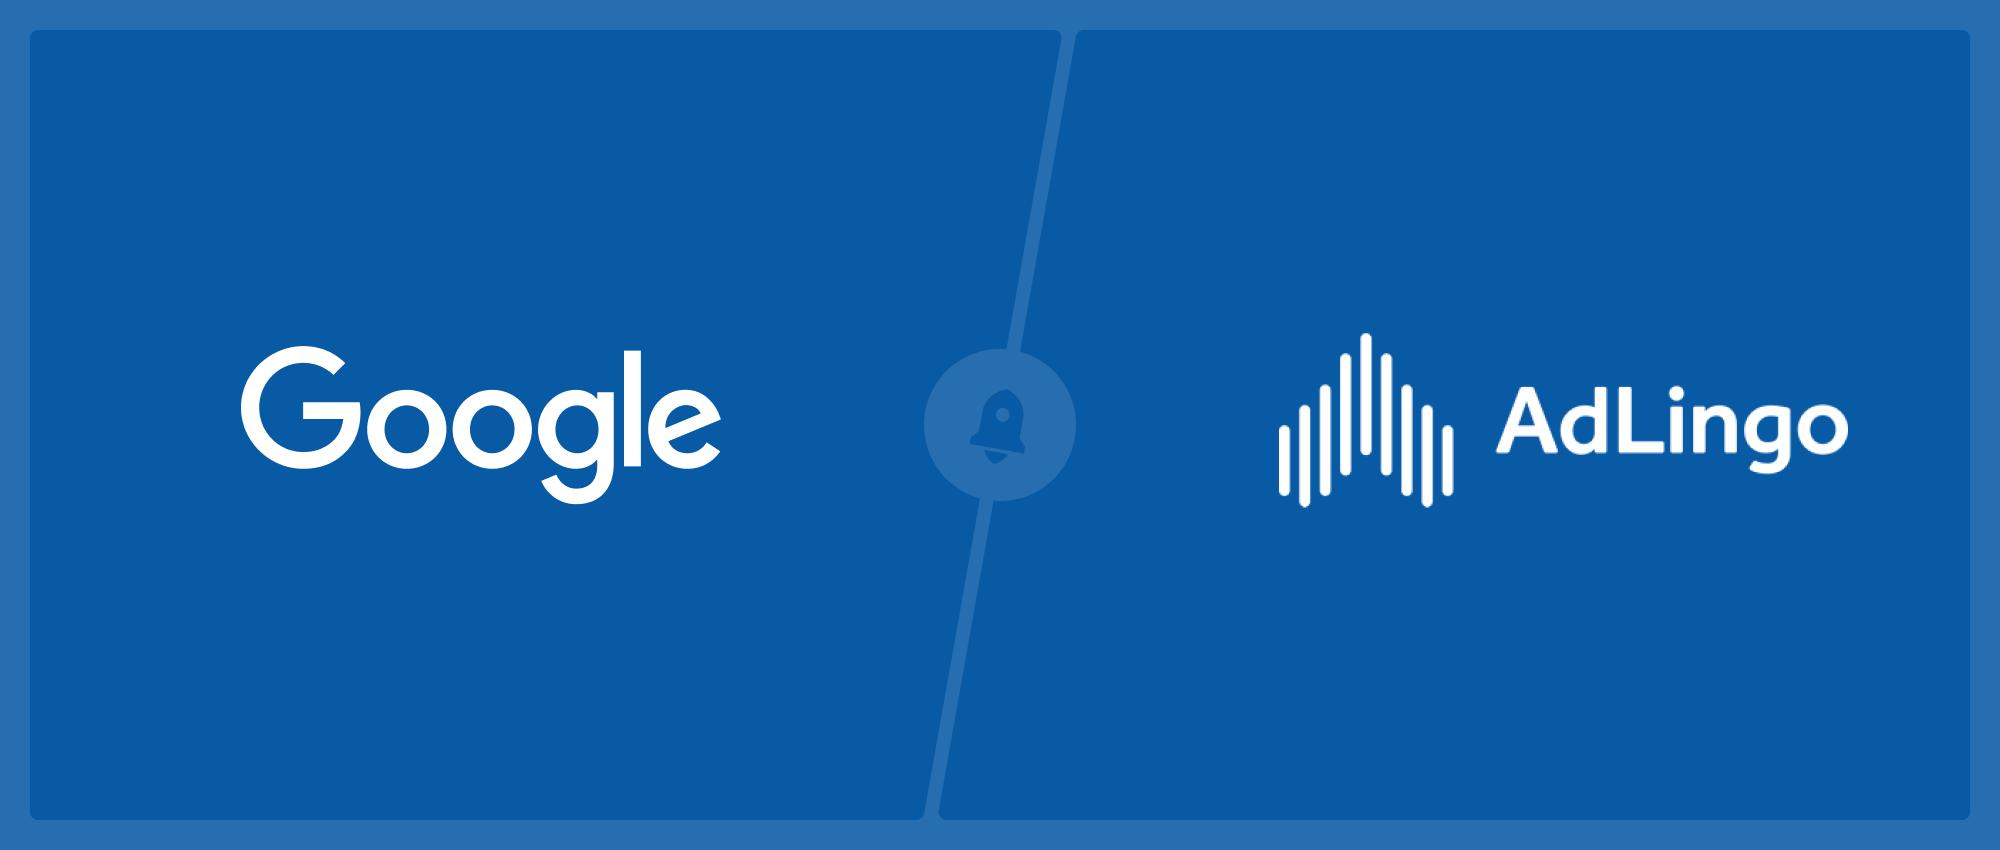 Google's AdLingo: Turning ads into AI-powered, personalised conversations.